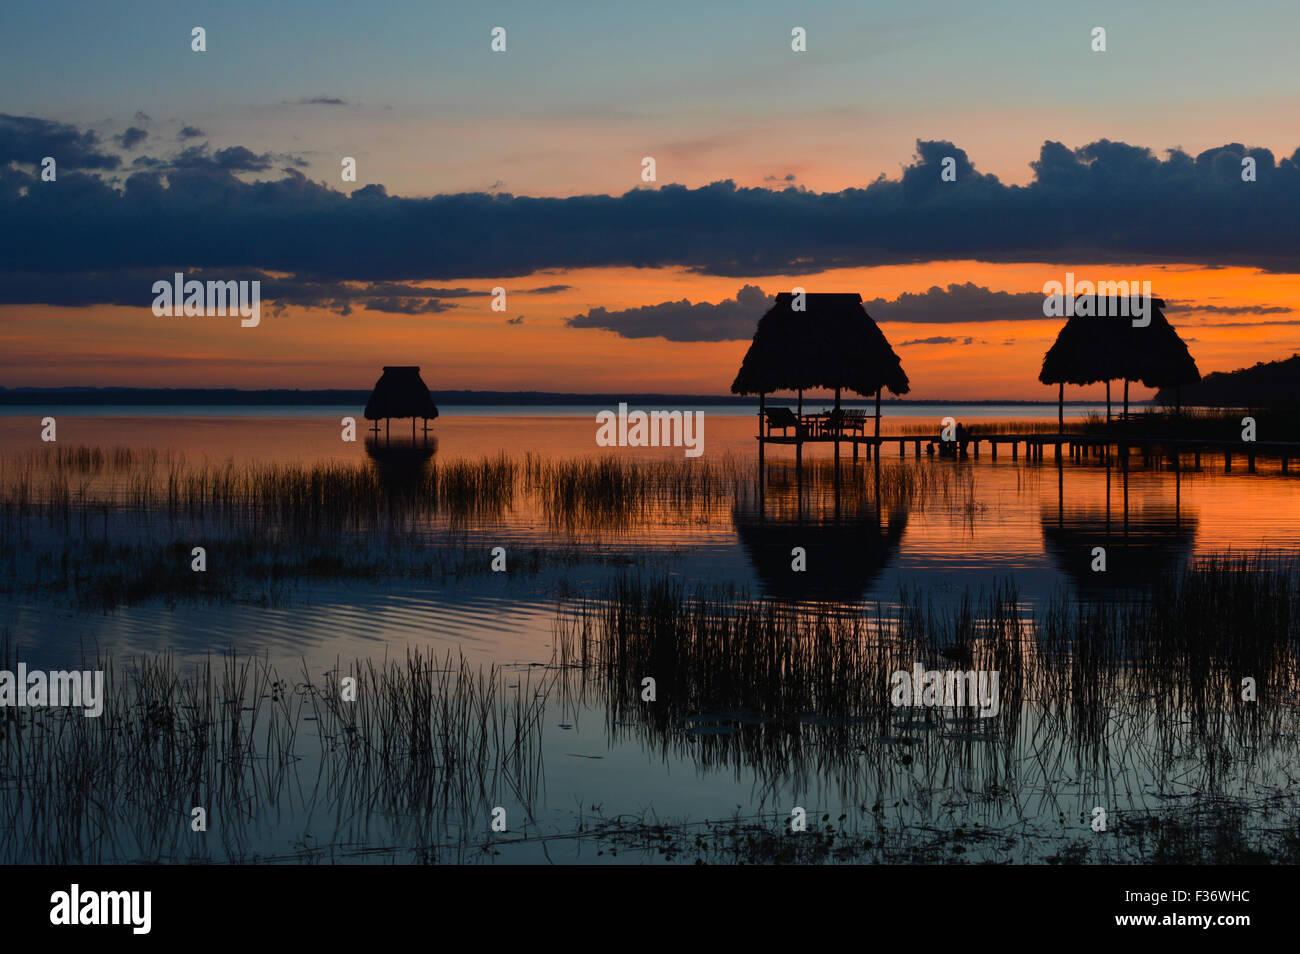 Sunset at the lake Peten Itza in El Ramate, Guatemala - Stock Image